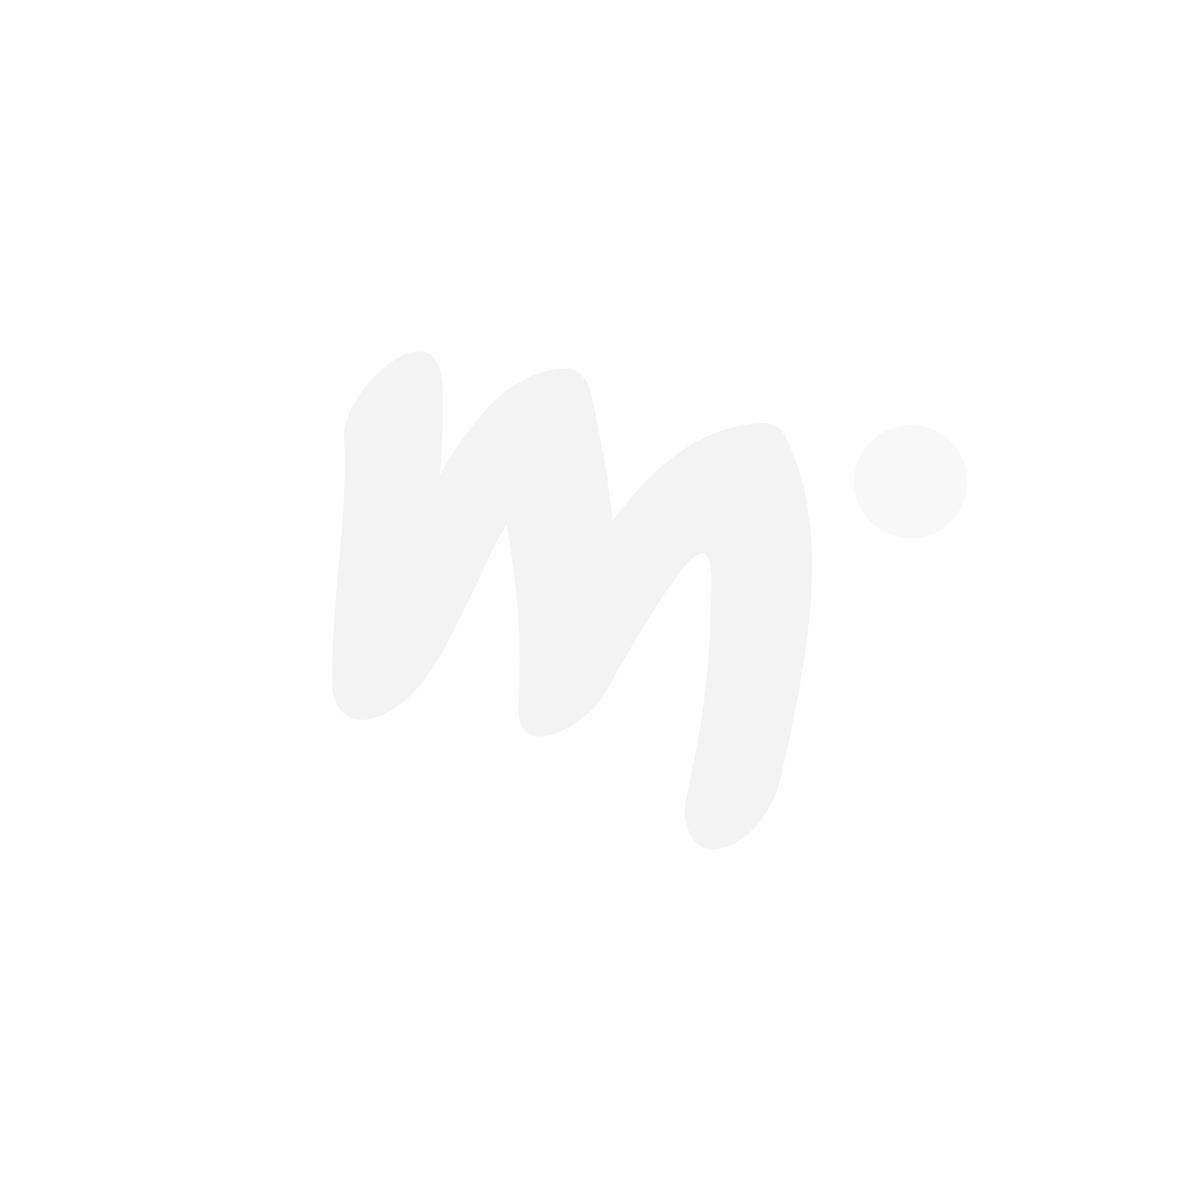 Moomin Characters Square Tins (Set of 3)